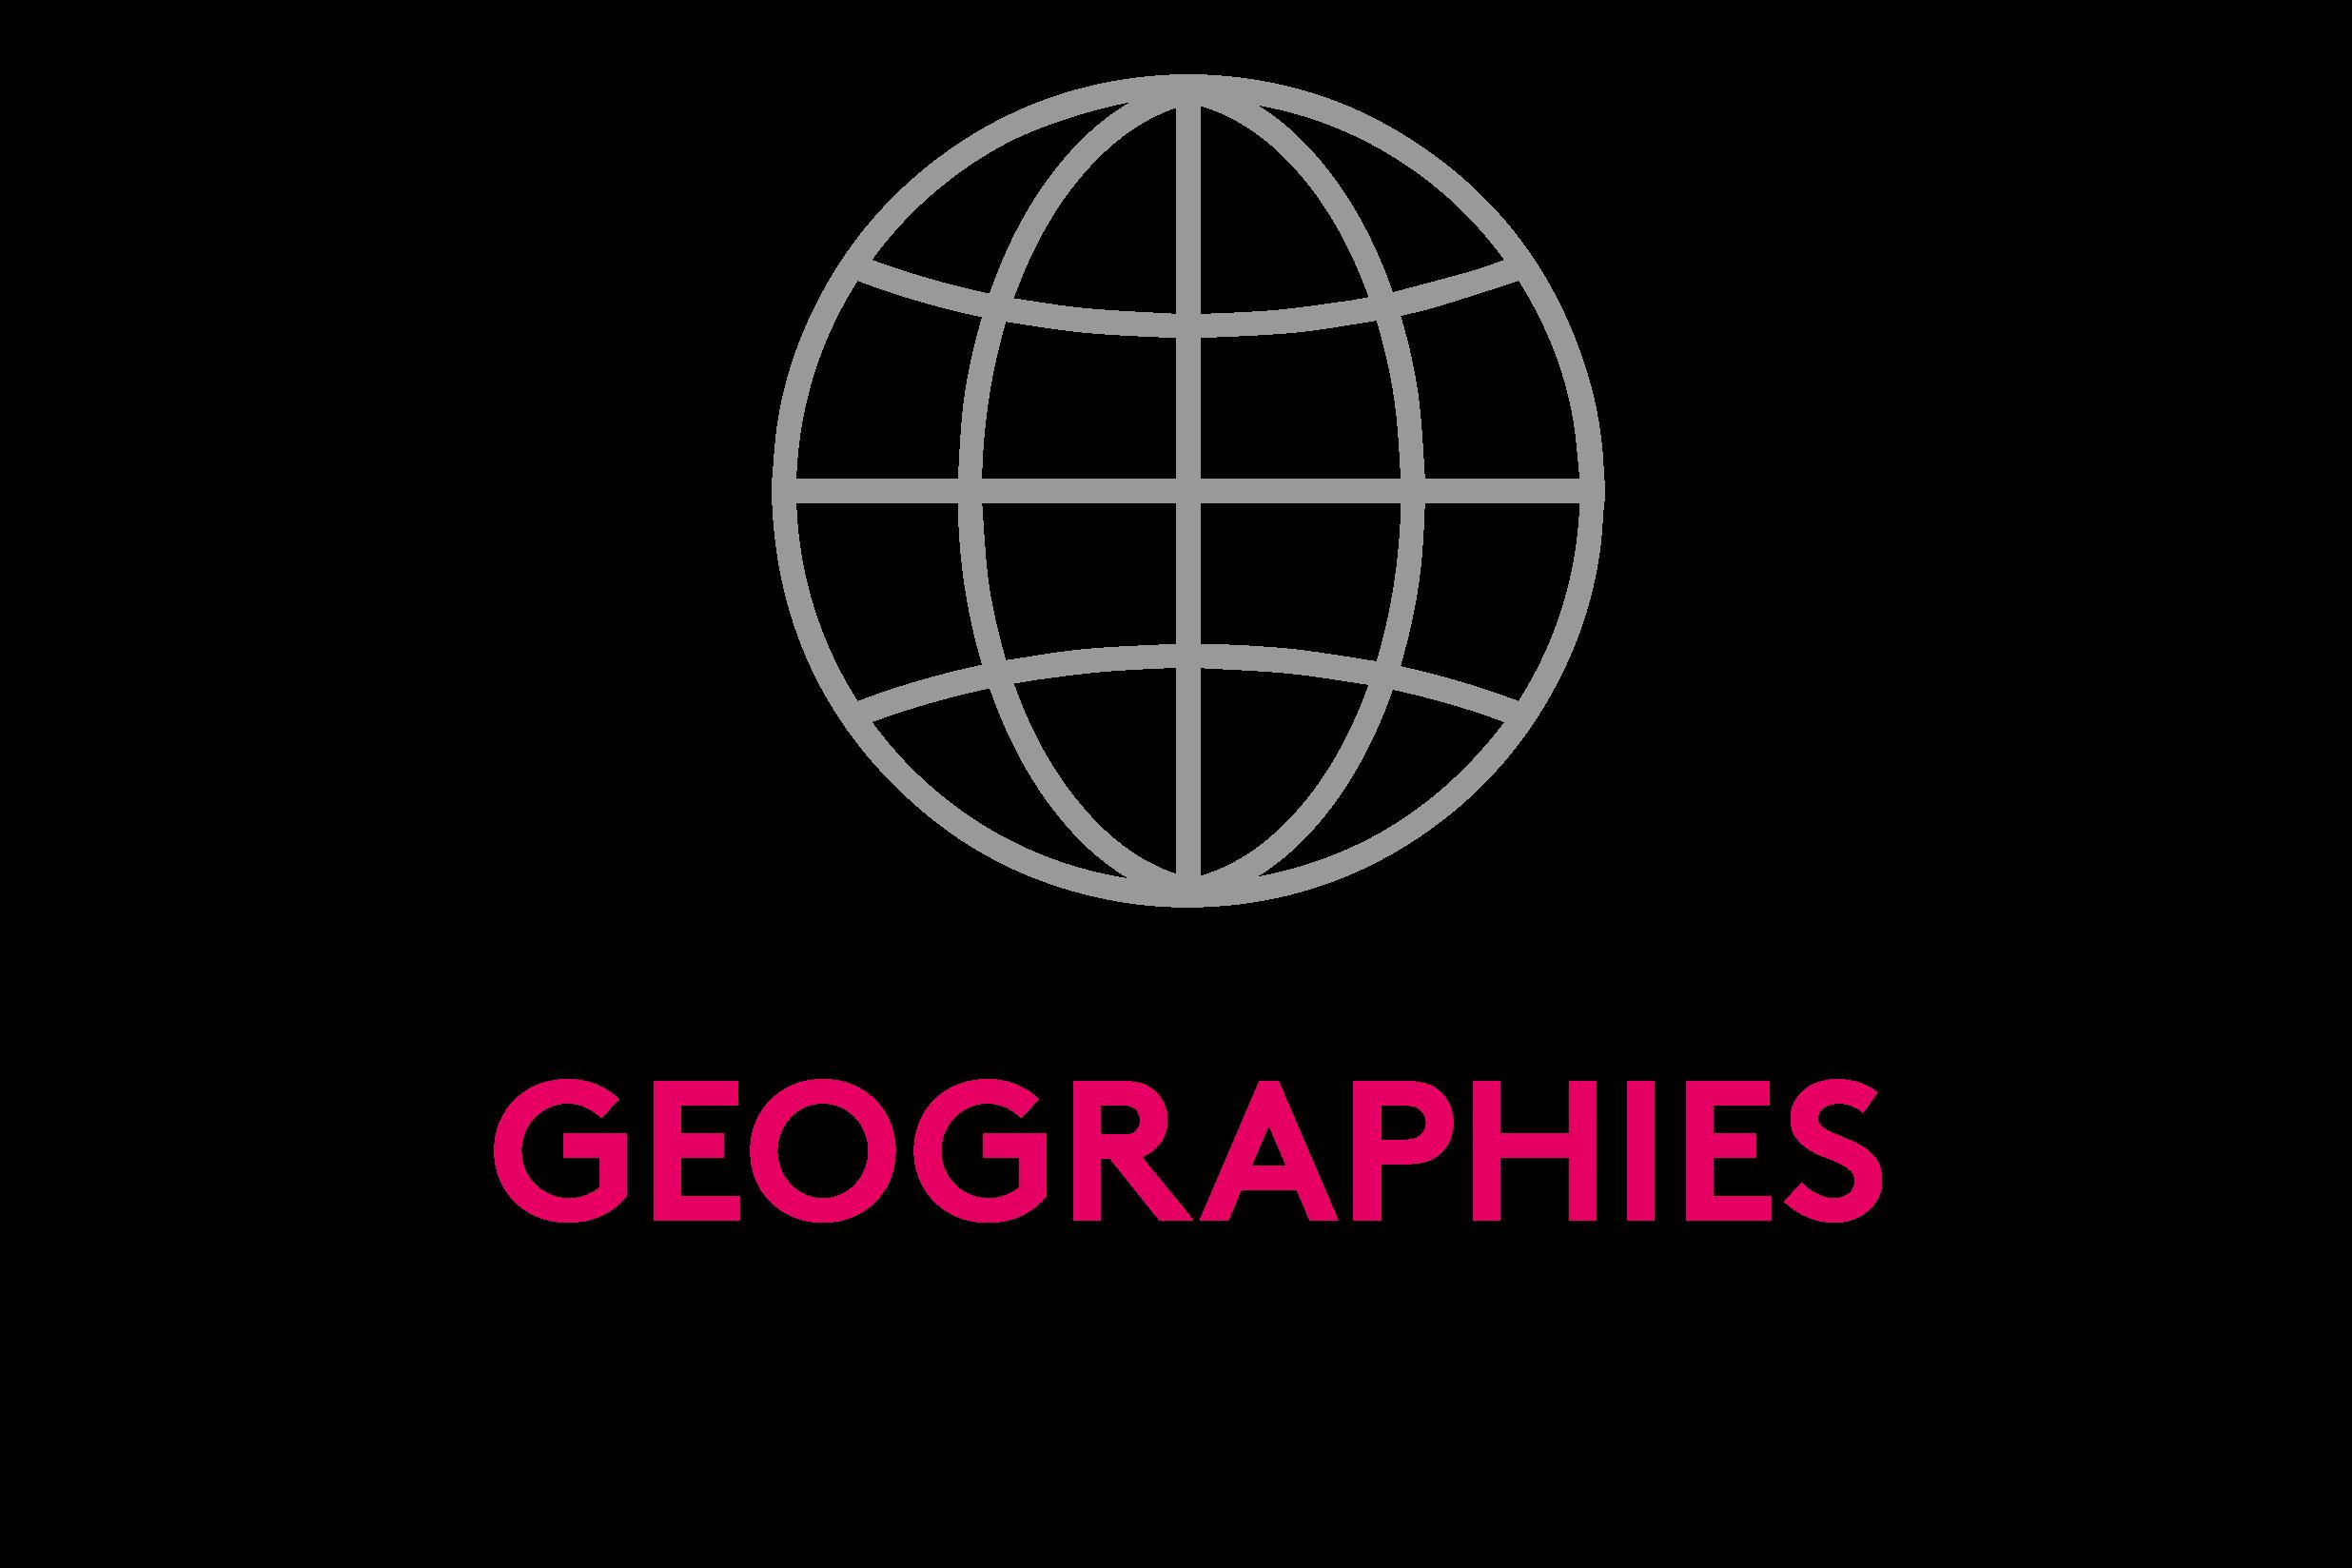 decision-making-platform-geographies